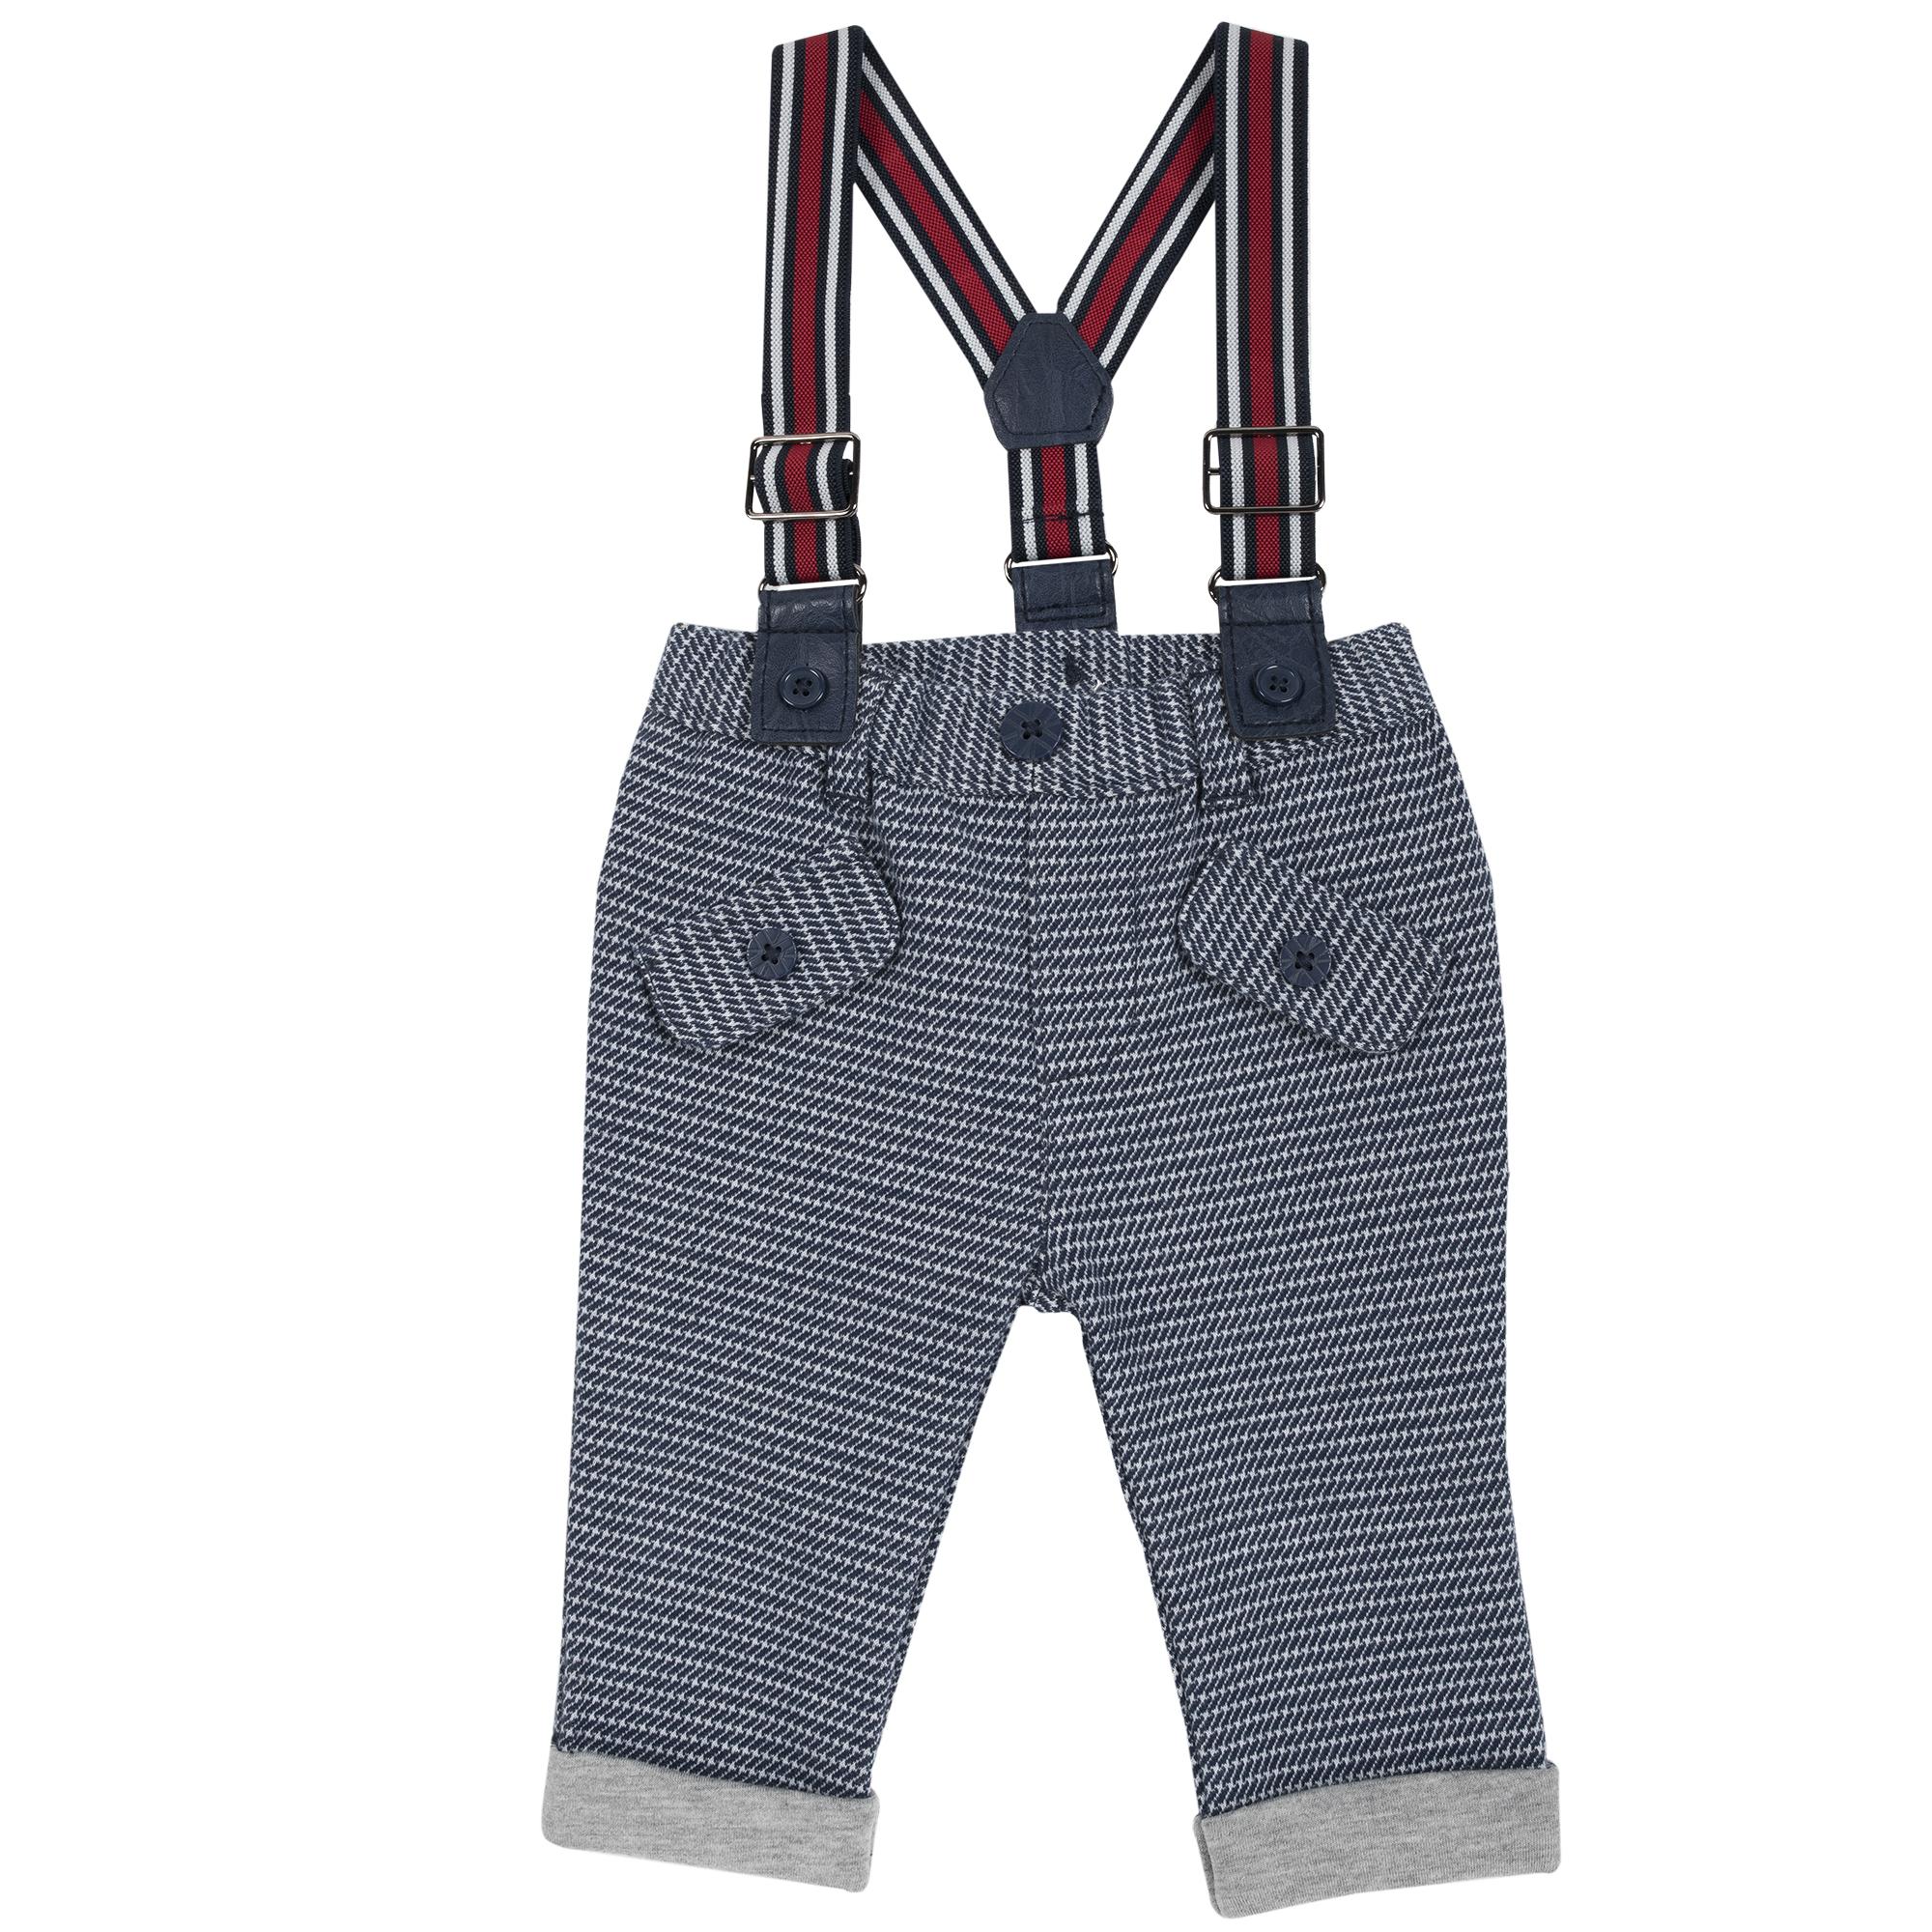 Pantalon copii Chicco albastru inchis 62